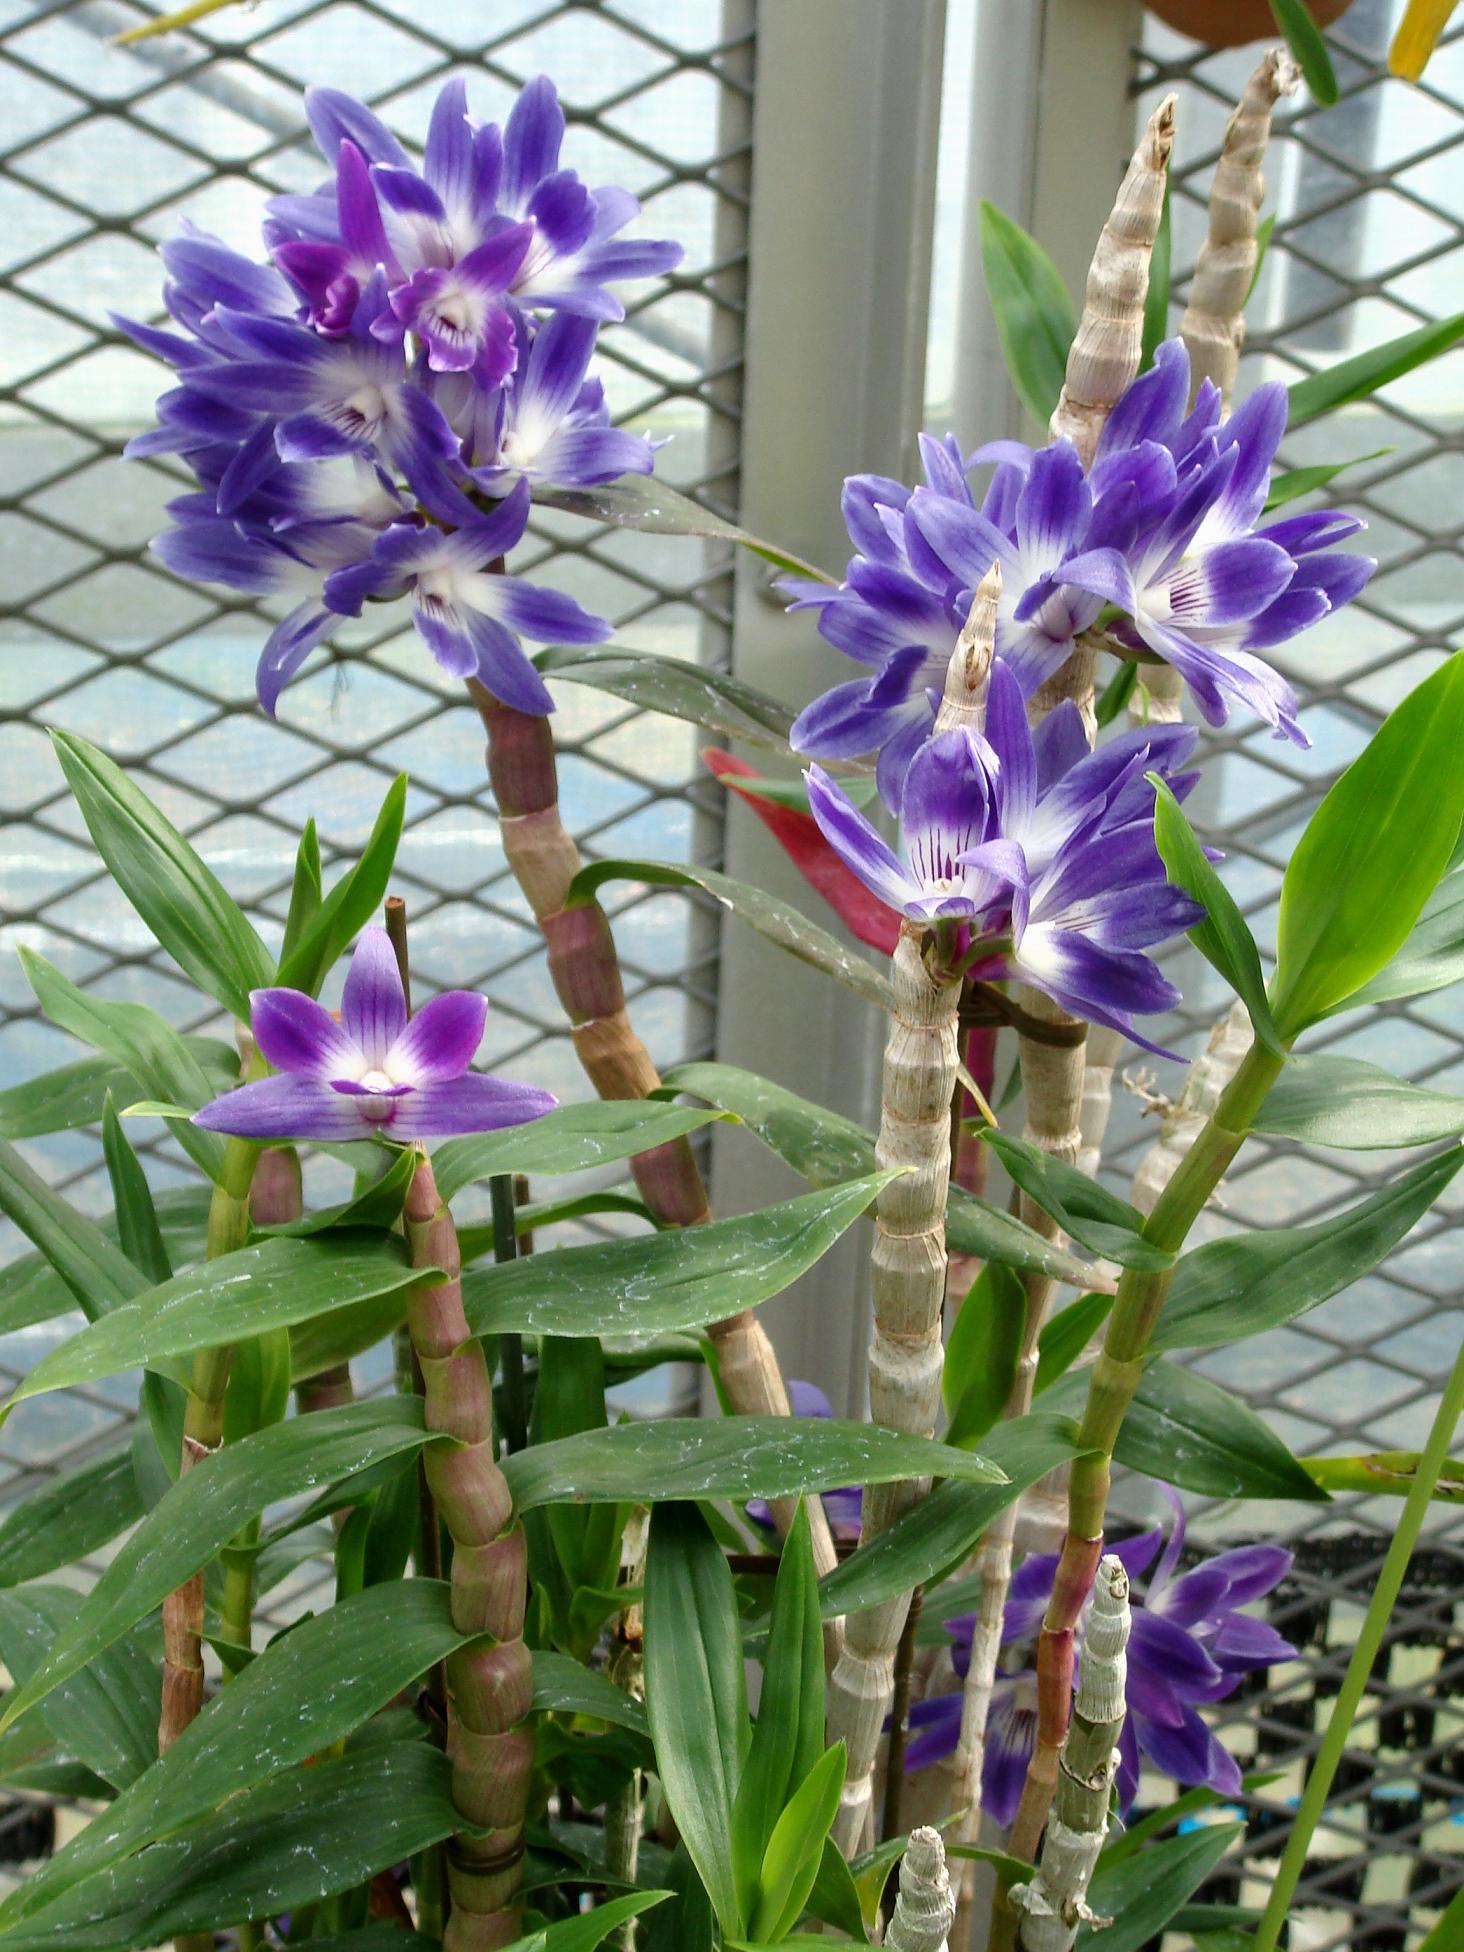 http://orchids.la.coocan.jp/Dendrobium/Dendrobium%20victoria-reginae/DSC03314.JPG